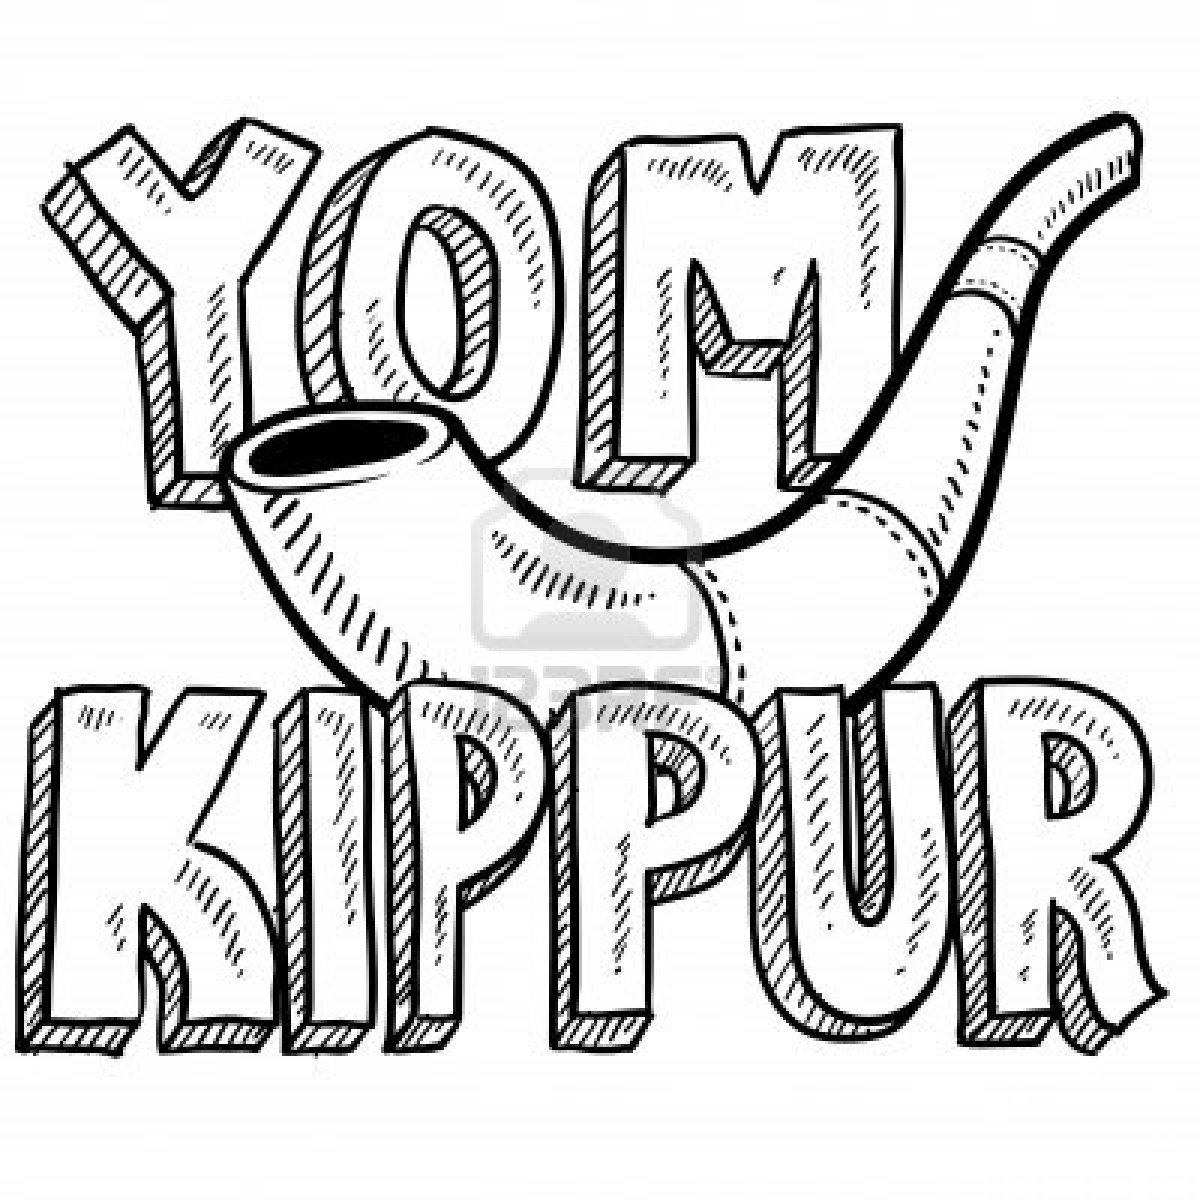 1200x1200 Coloring Pages Yom Kippur Jewish Holidays For Avi